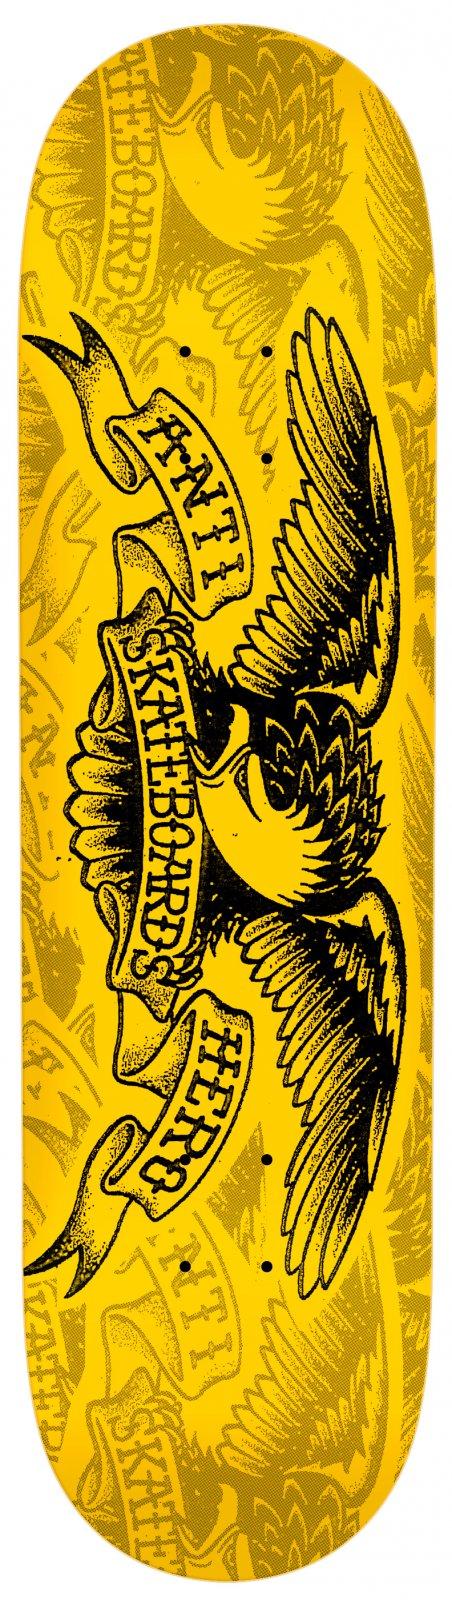 Anti Hero Copier Eagle PP 8.5 x 32.25 Skateboard Deck